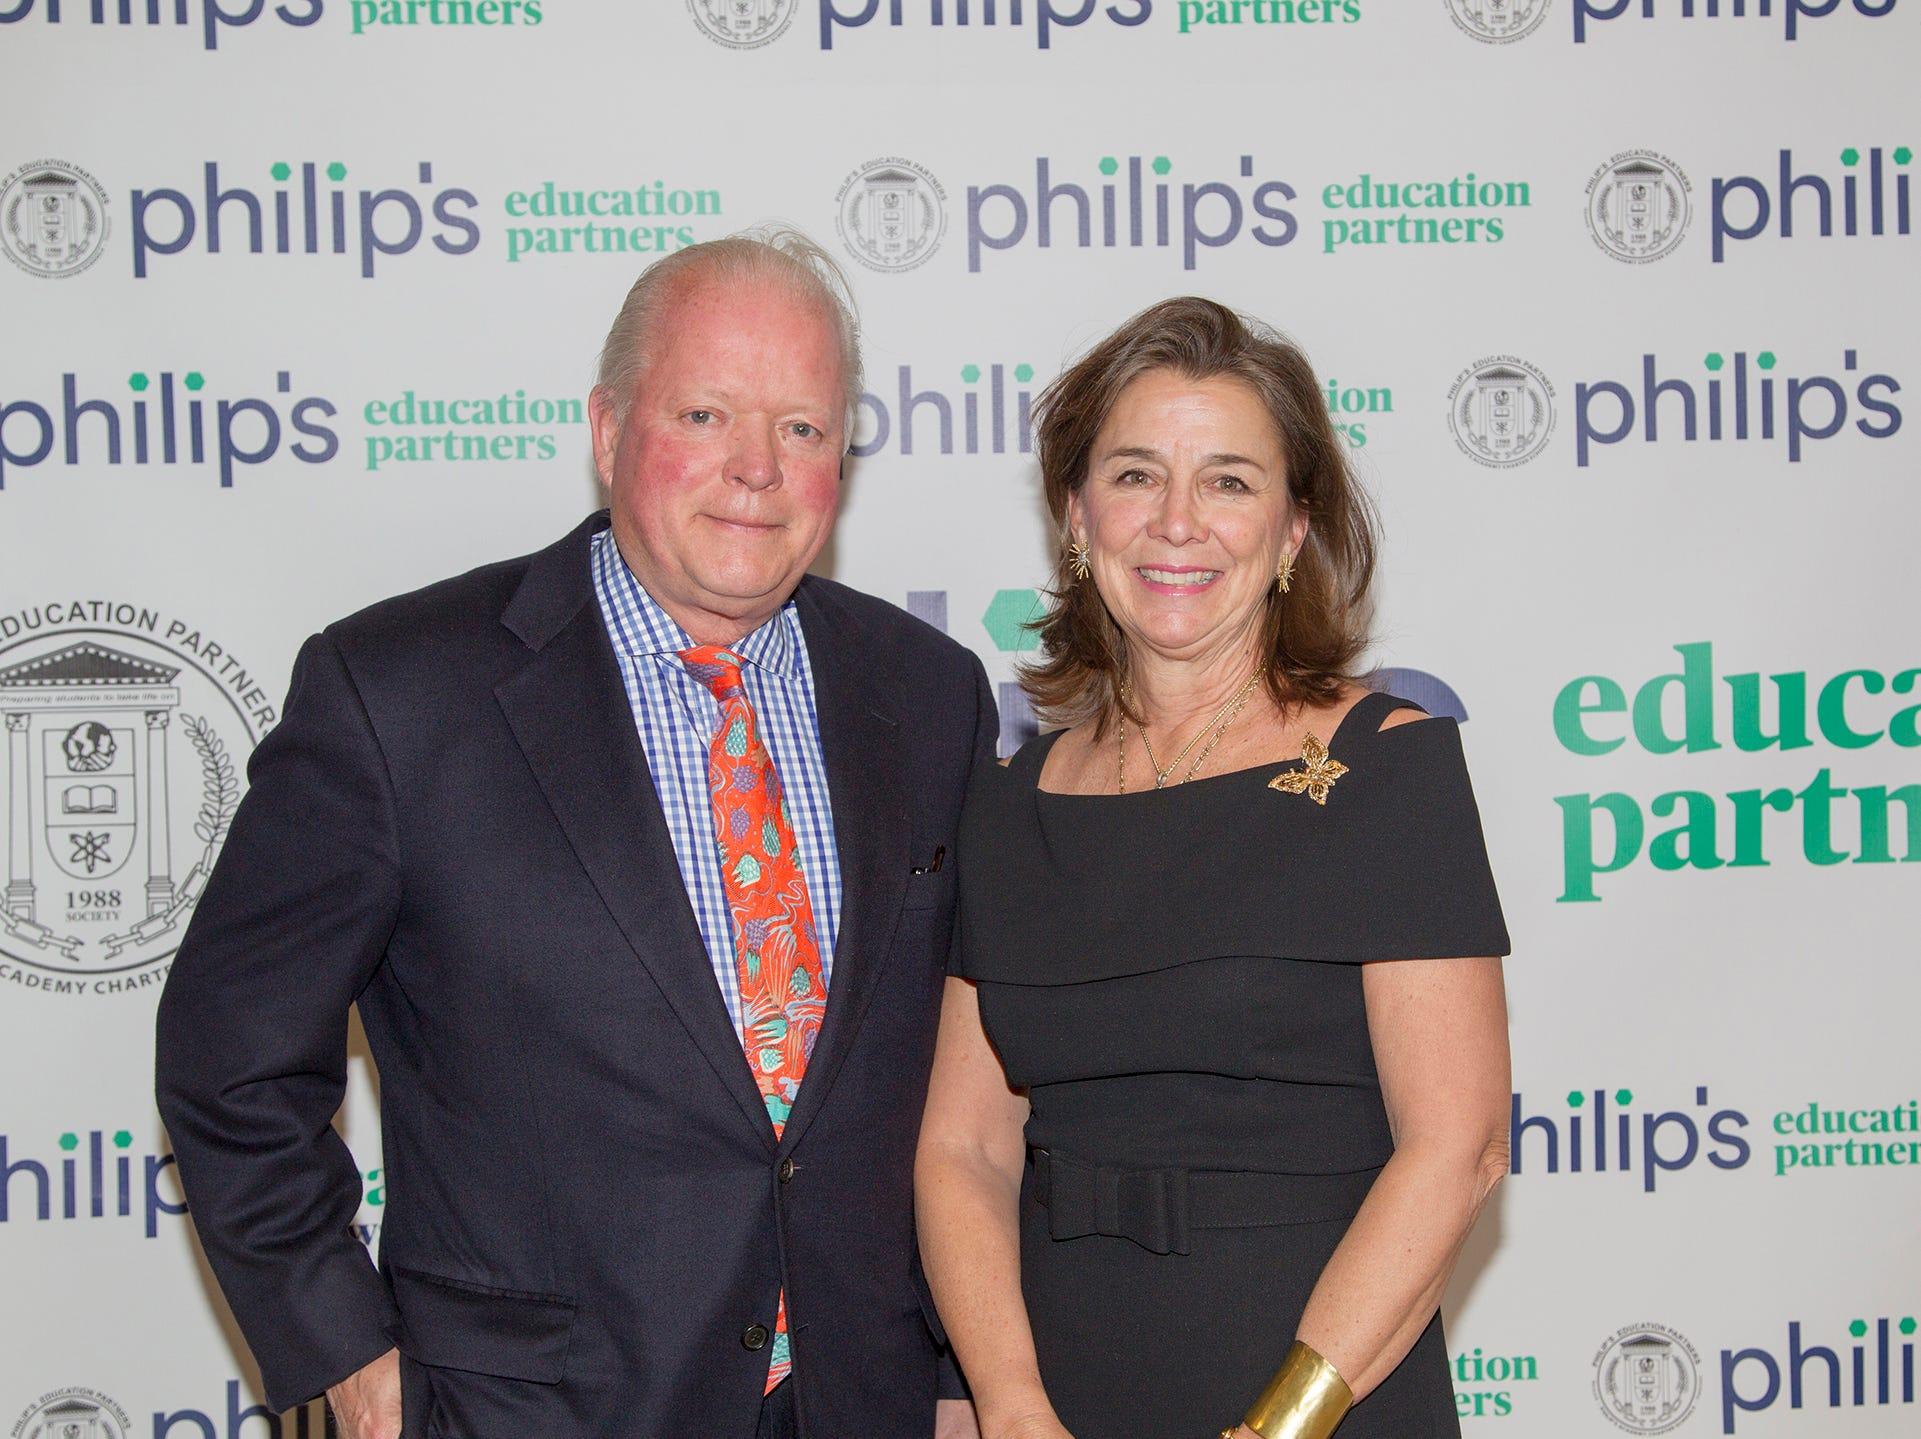 Curt and Cissy Viebranz. Philip's Education Partners host The Dream Maker 30th anniversary gala at The Mezzanine in Newark 3/29/2019.